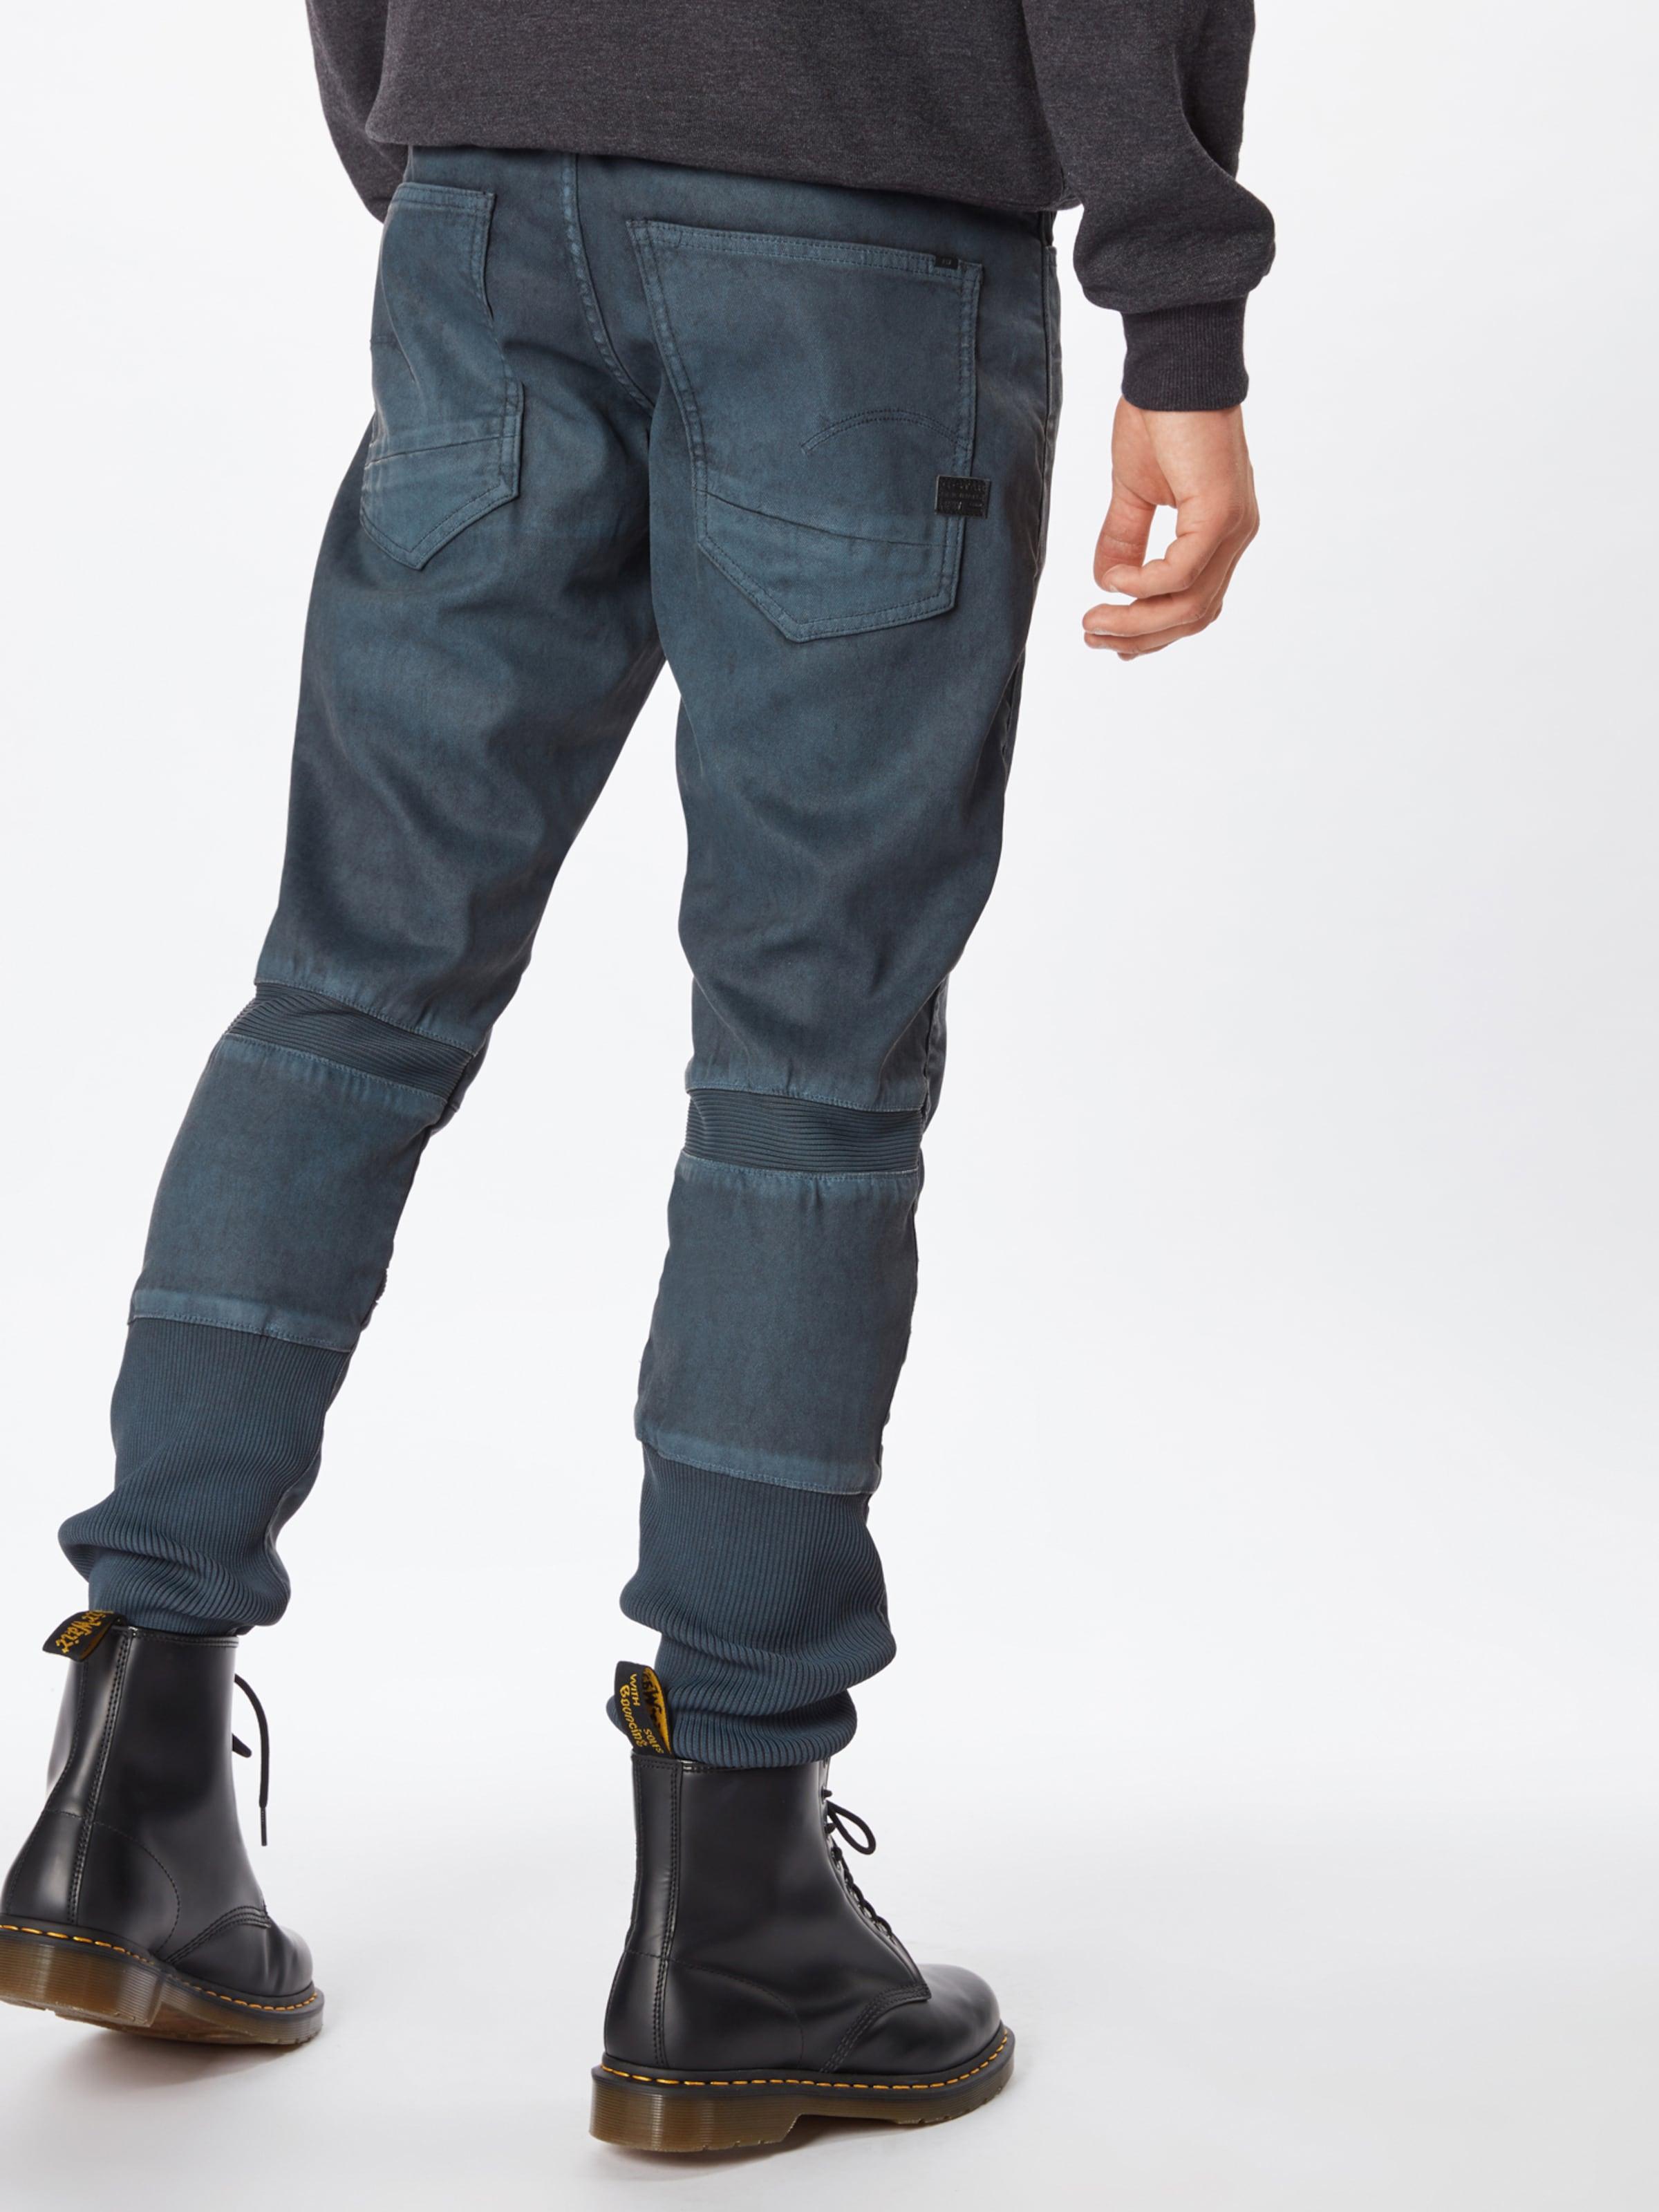 star Jean Slim' En Denim Raw 'motac G Bleu 3d Sec yNvOm8w0n